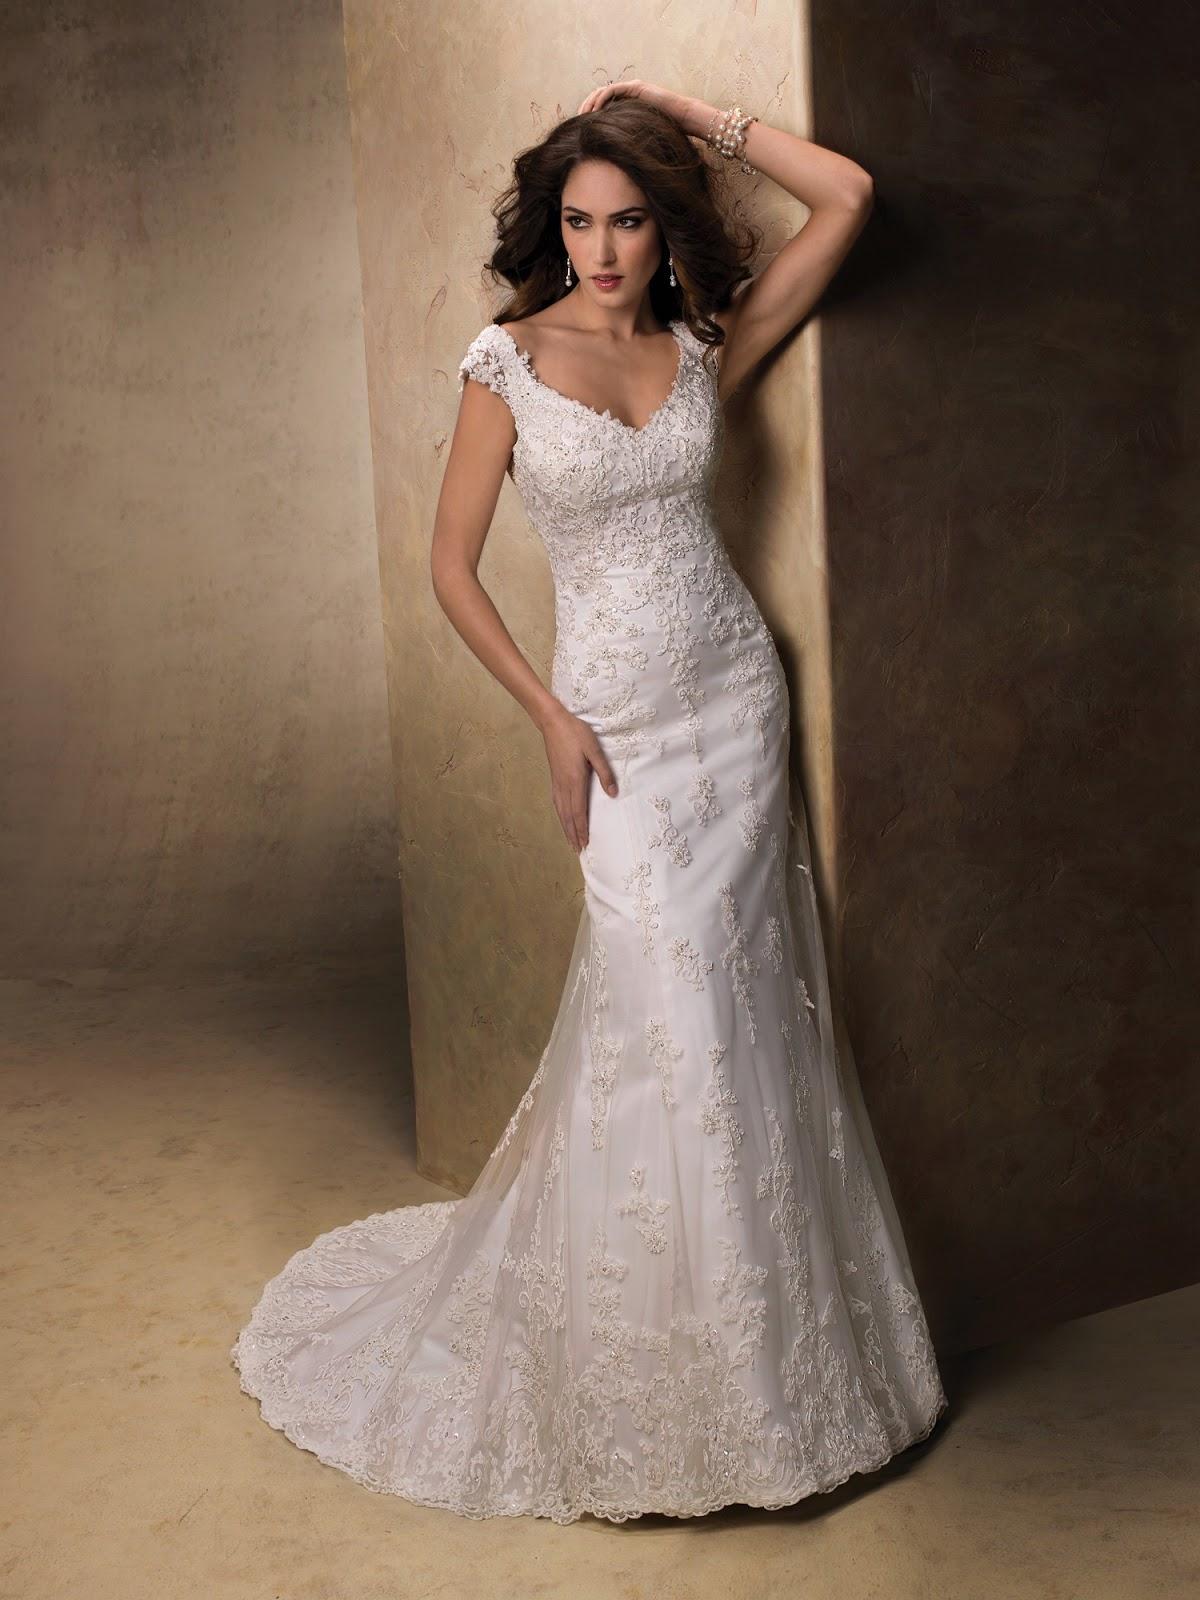 1000 or less wedding dresses